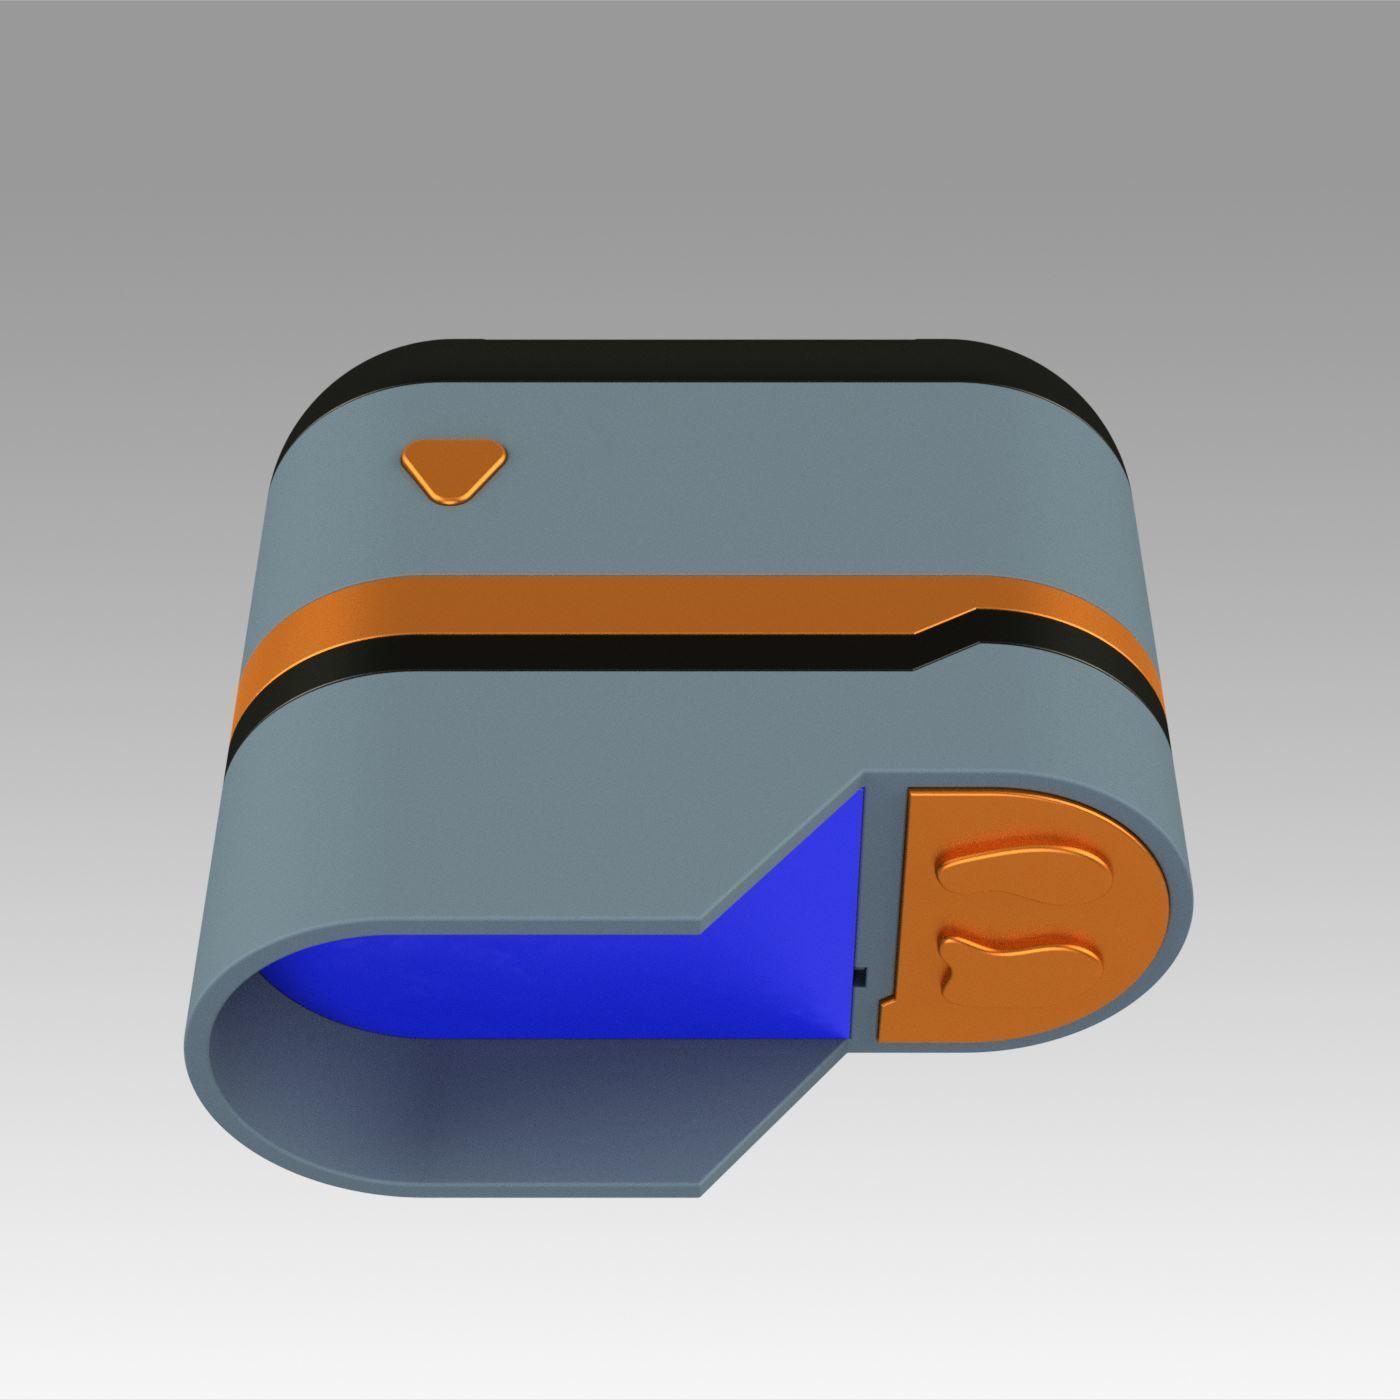 9.jpg Download OBJ file Star Trek Prop Dr Phlox Scanner replica prop cosplay • 3D printer object, Blackeveryday